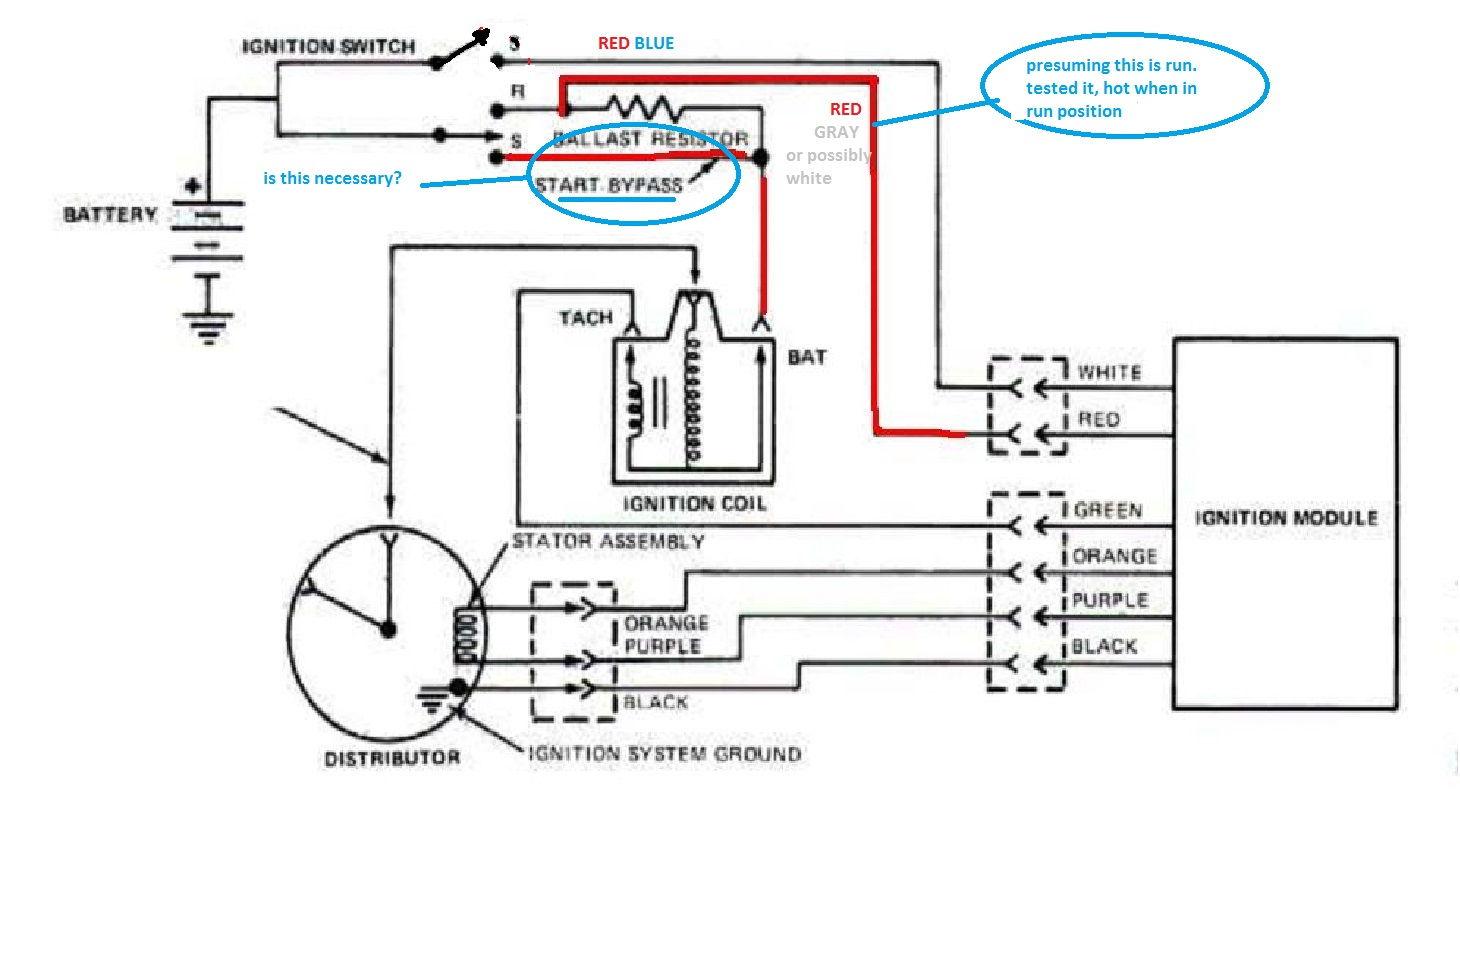 Diagram 1985 Ford Ignition Wire Diagram Full Version Hd Quality Wire Diagram Ritualdiagrams Politopendays It